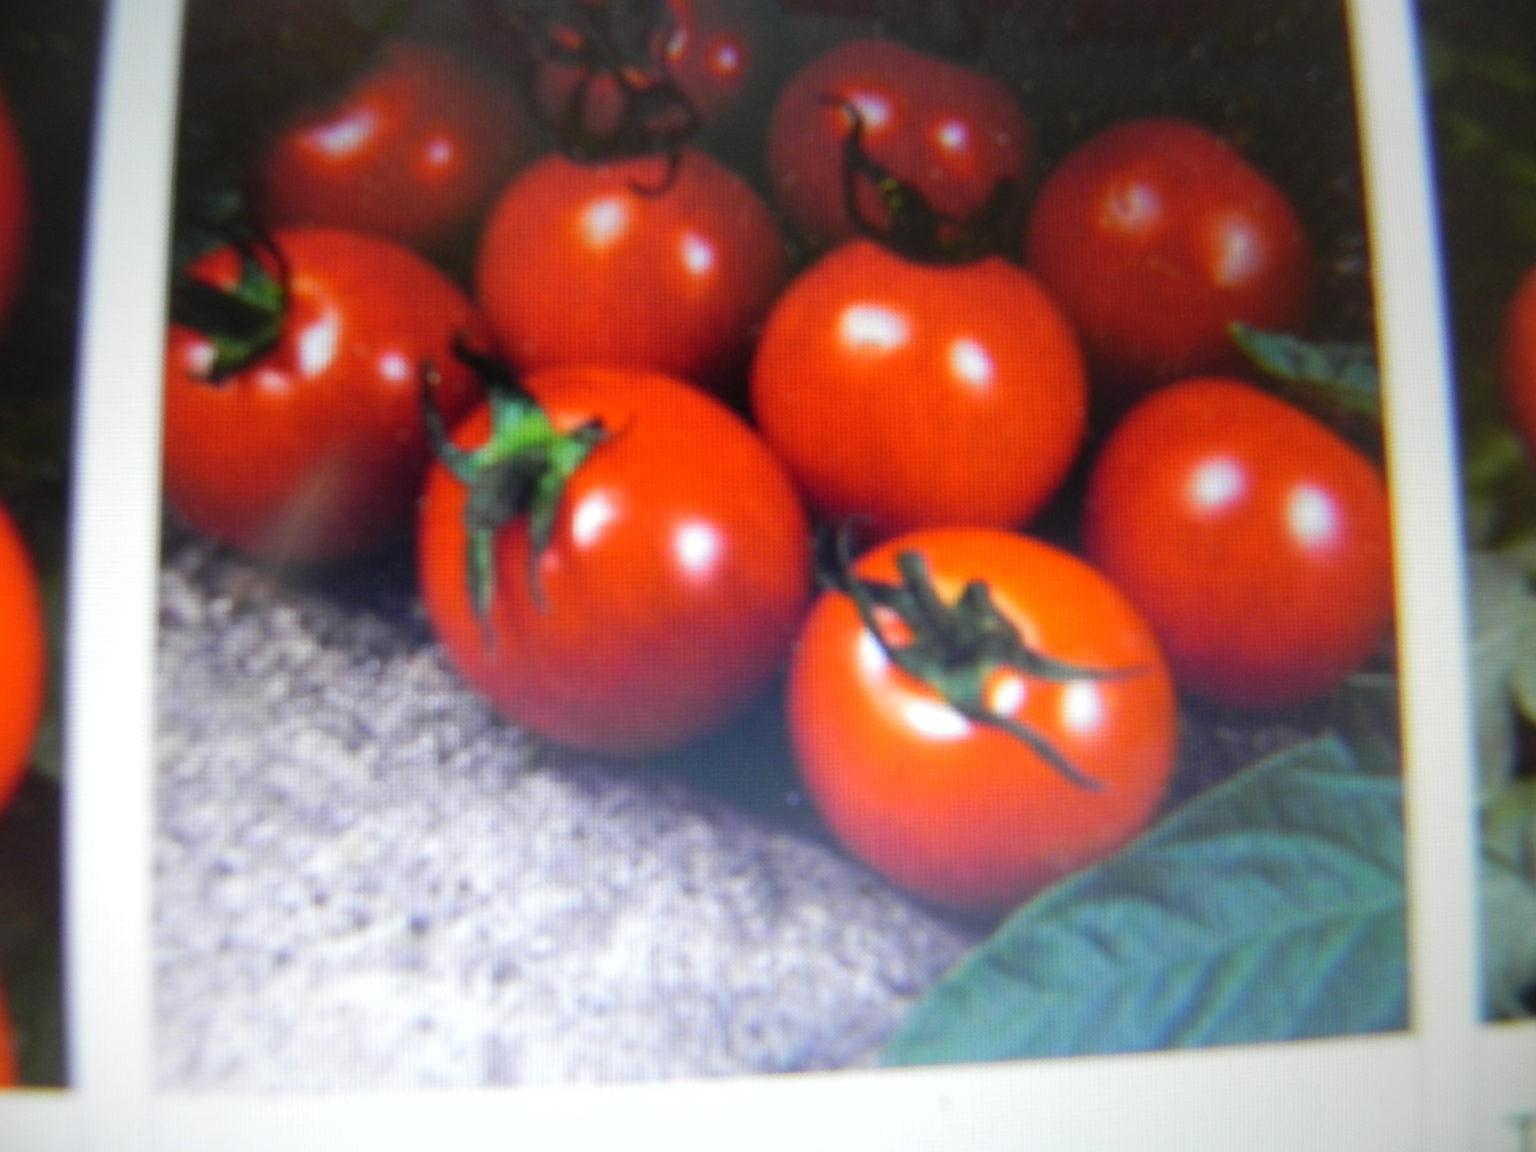 Tomato Alicante Heavy cropping tomato early harvest